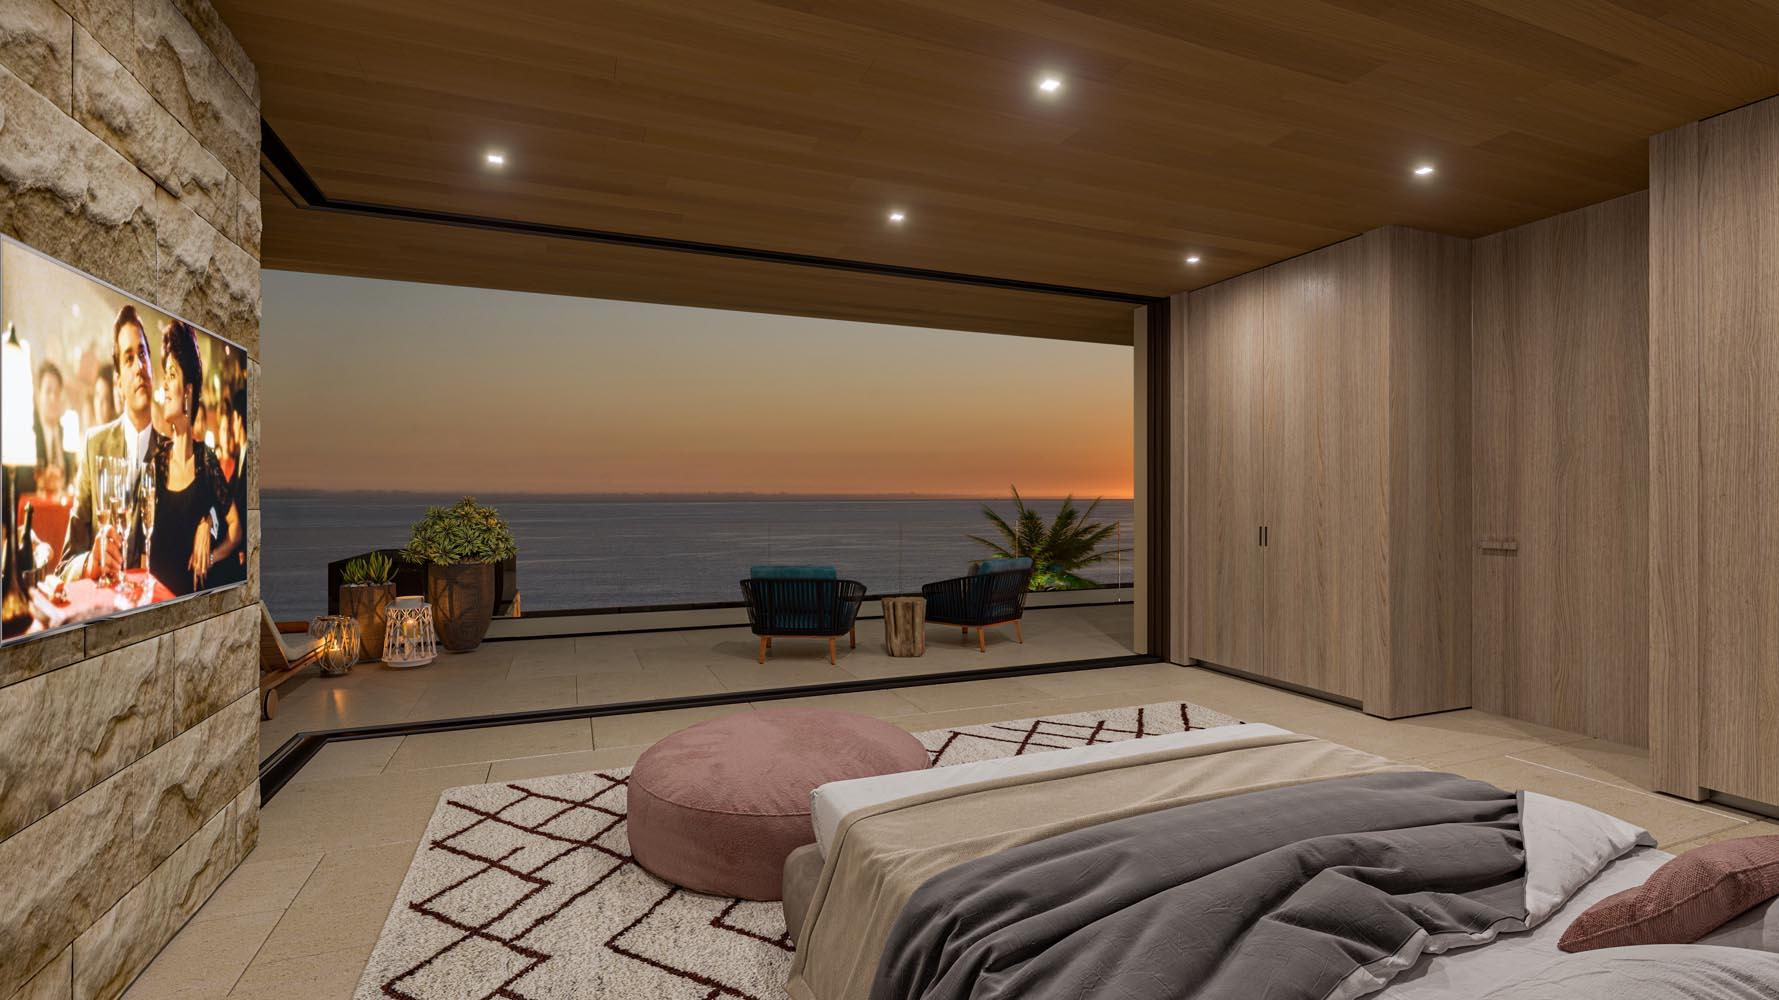 Lot 14 Marisol Malibu Upper Bedroom